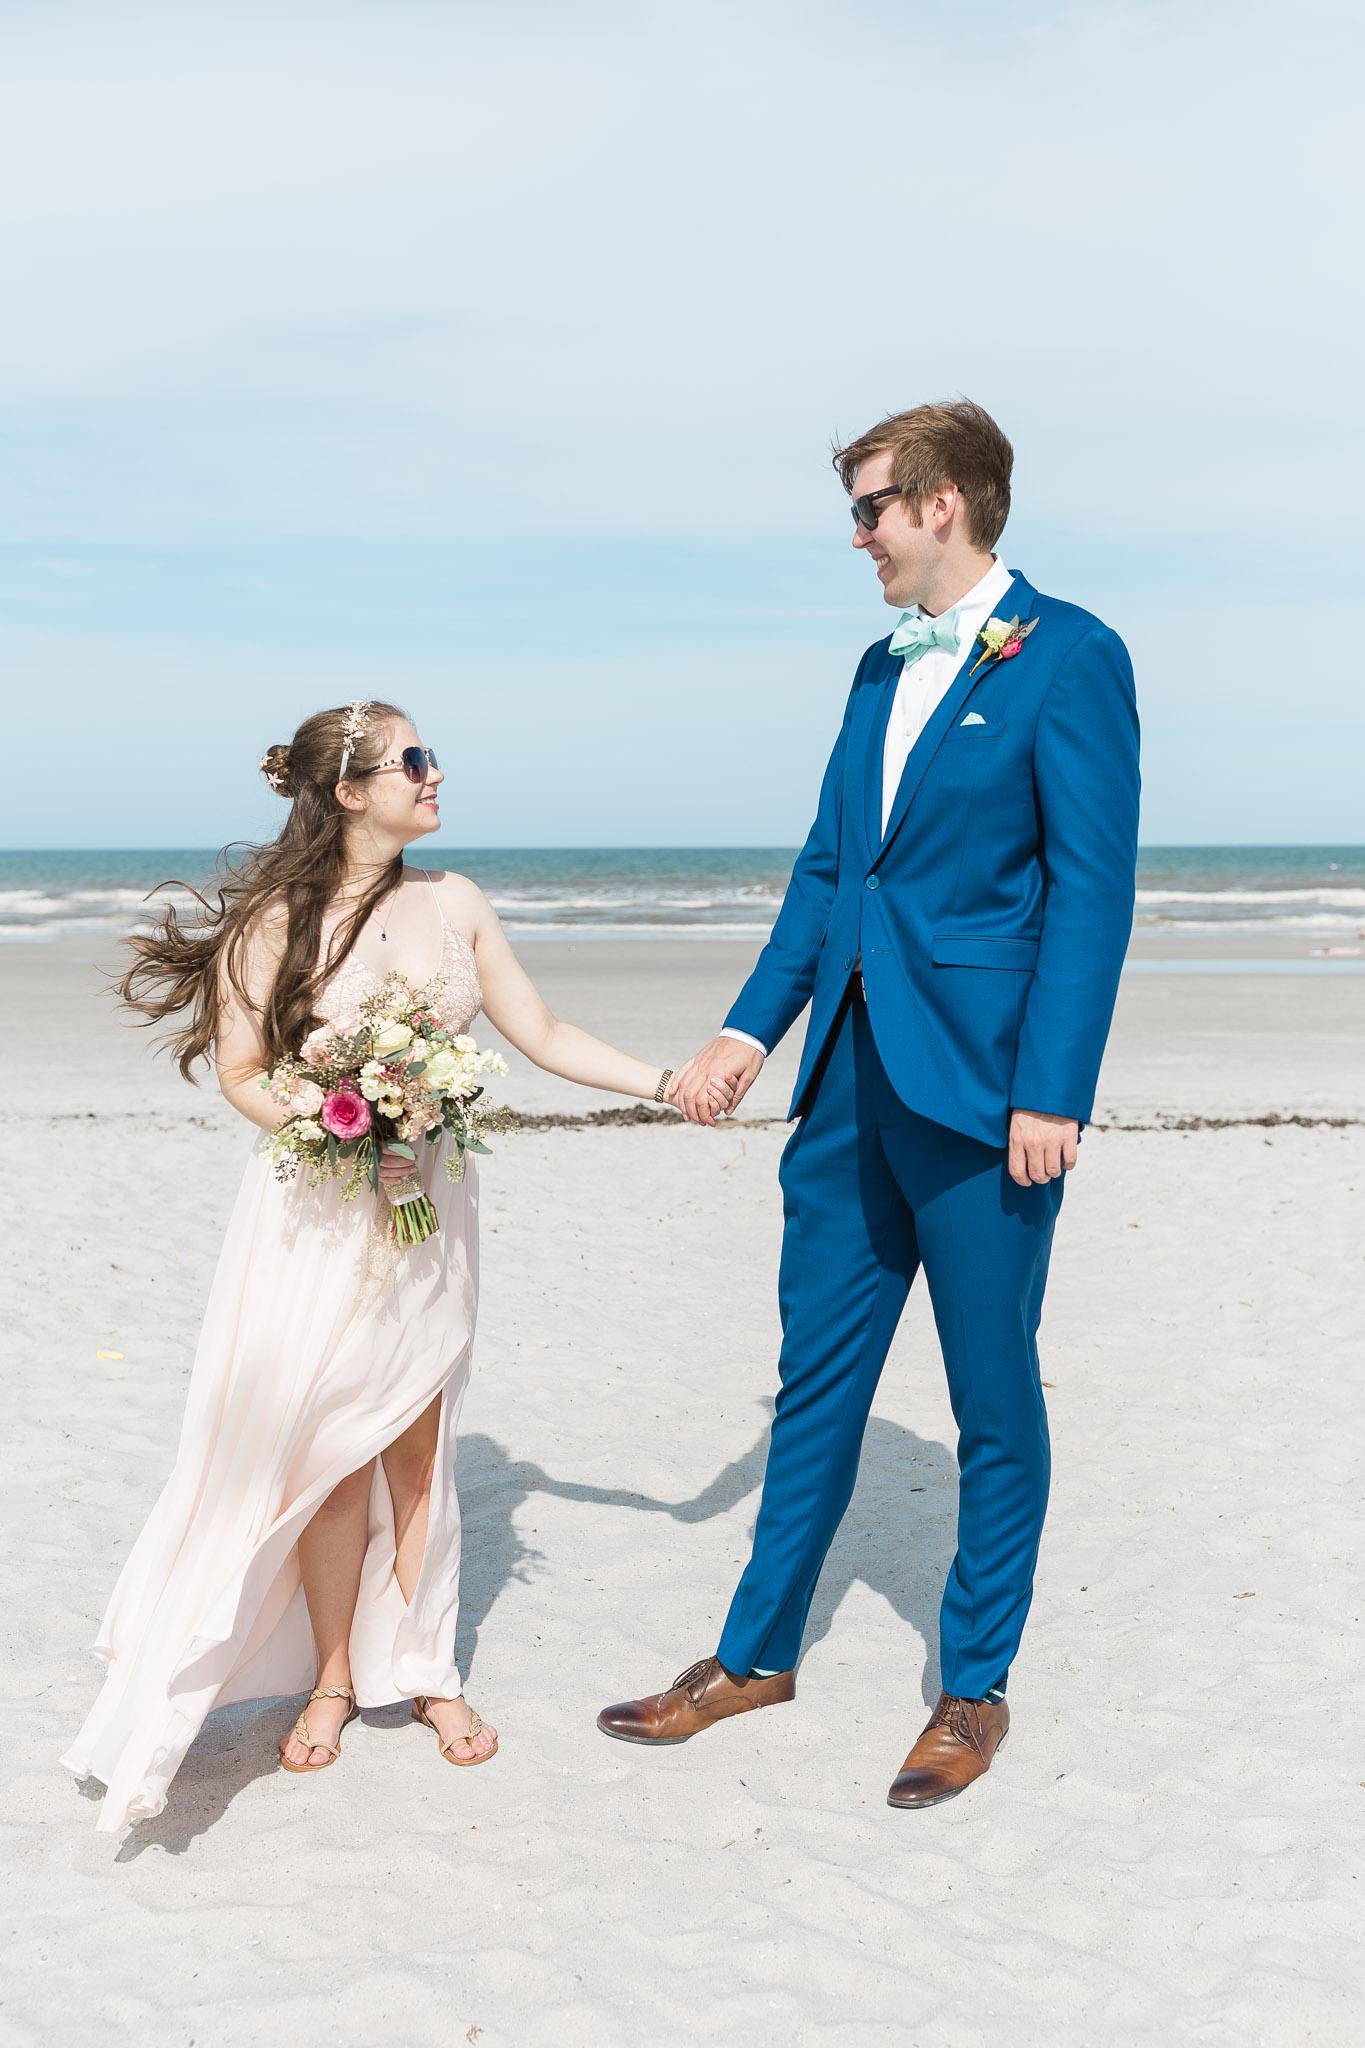 beach wedding photographer.jpg